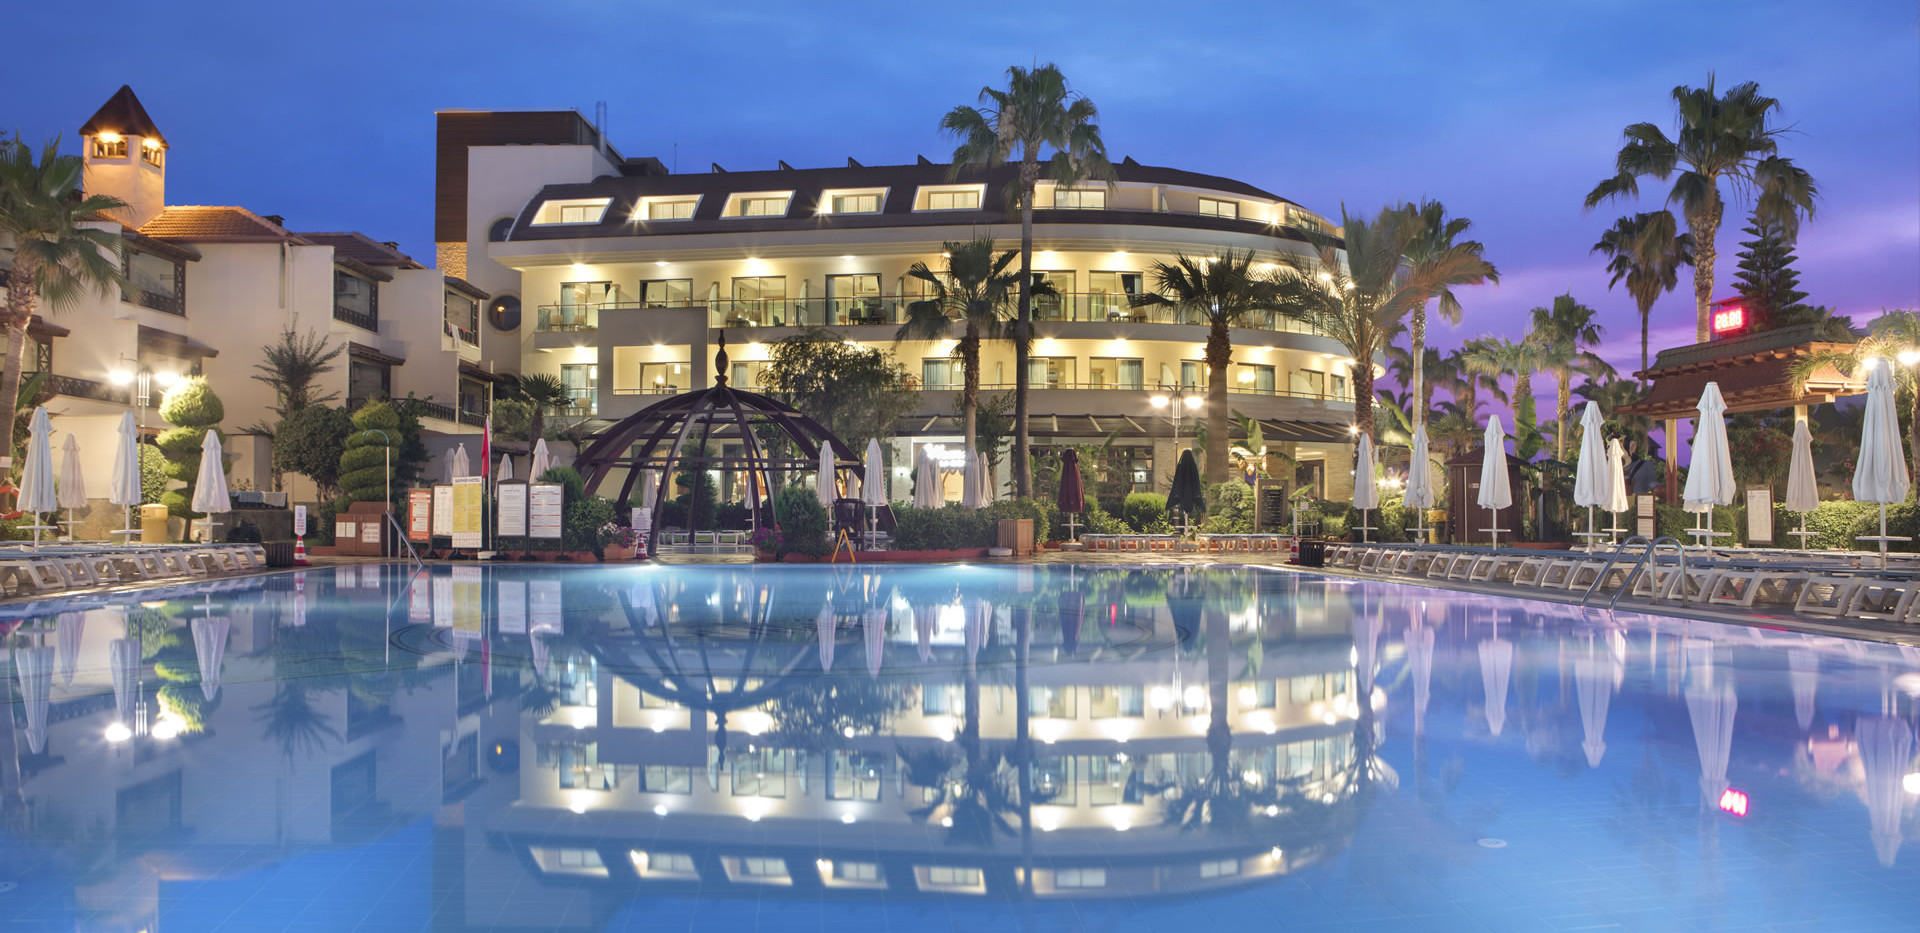 saphir-hotel-villas-otelimiz-795.jpg